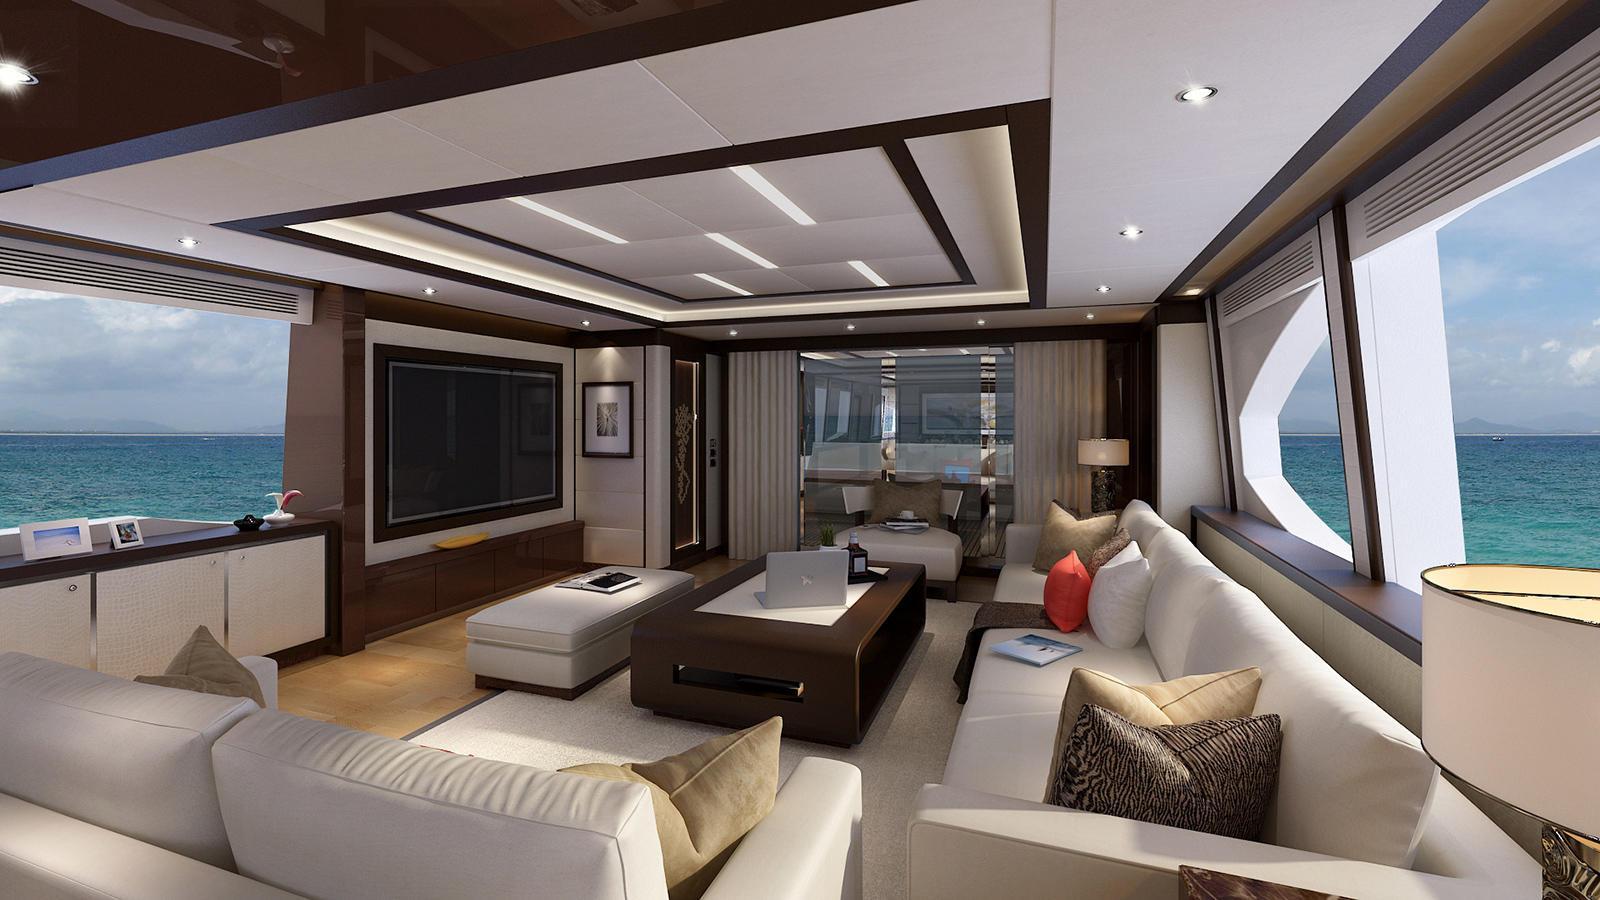 Asteria 108 motoryacht HeySea Yachts 33m 2020 saloon sistership